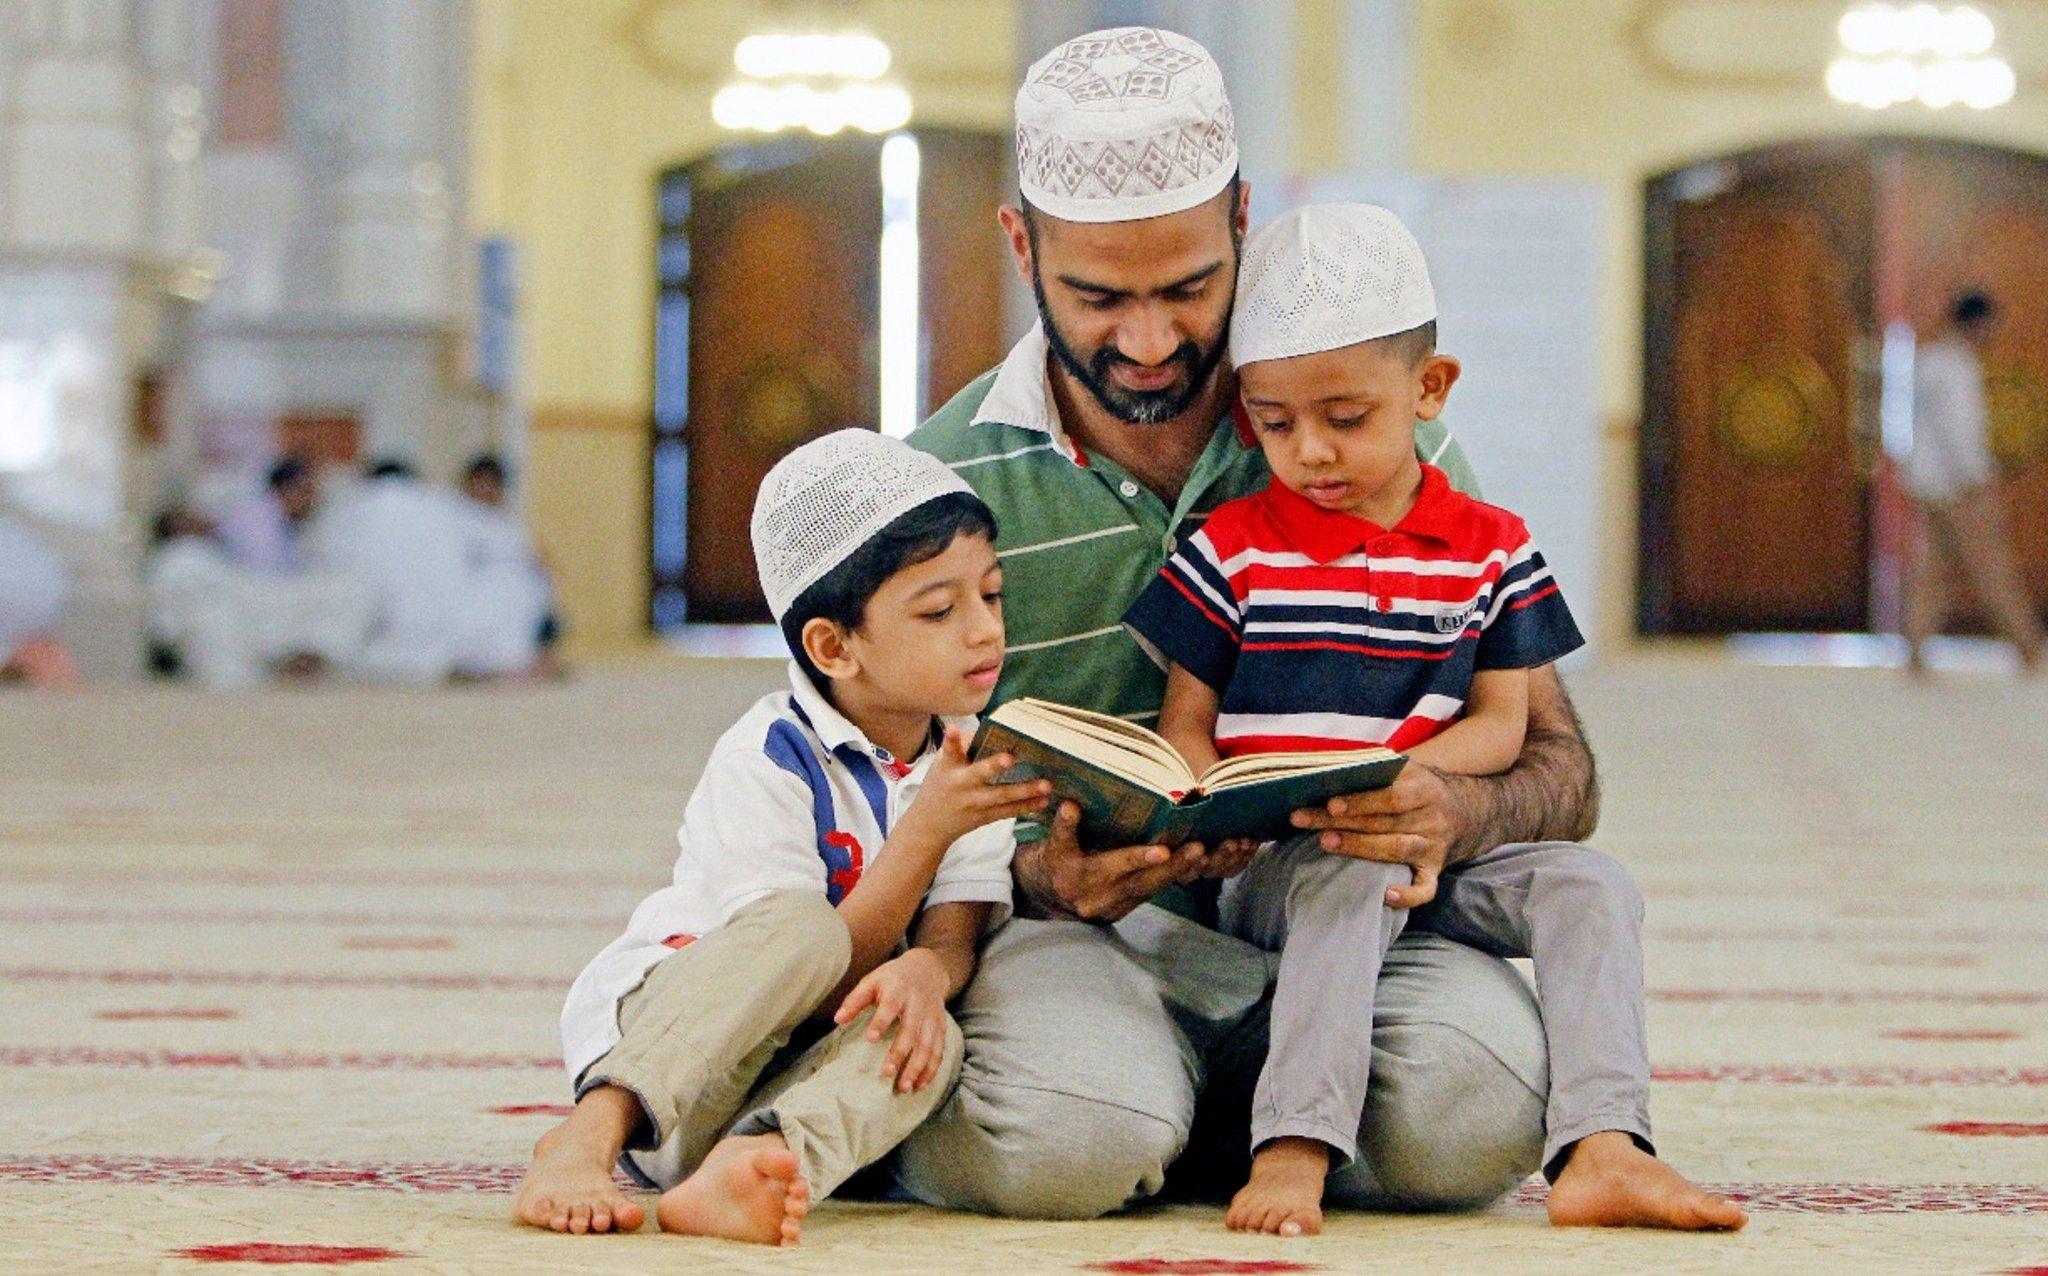 Всё о рамадане (статьи. фото. видео. открытки)   islam.ru